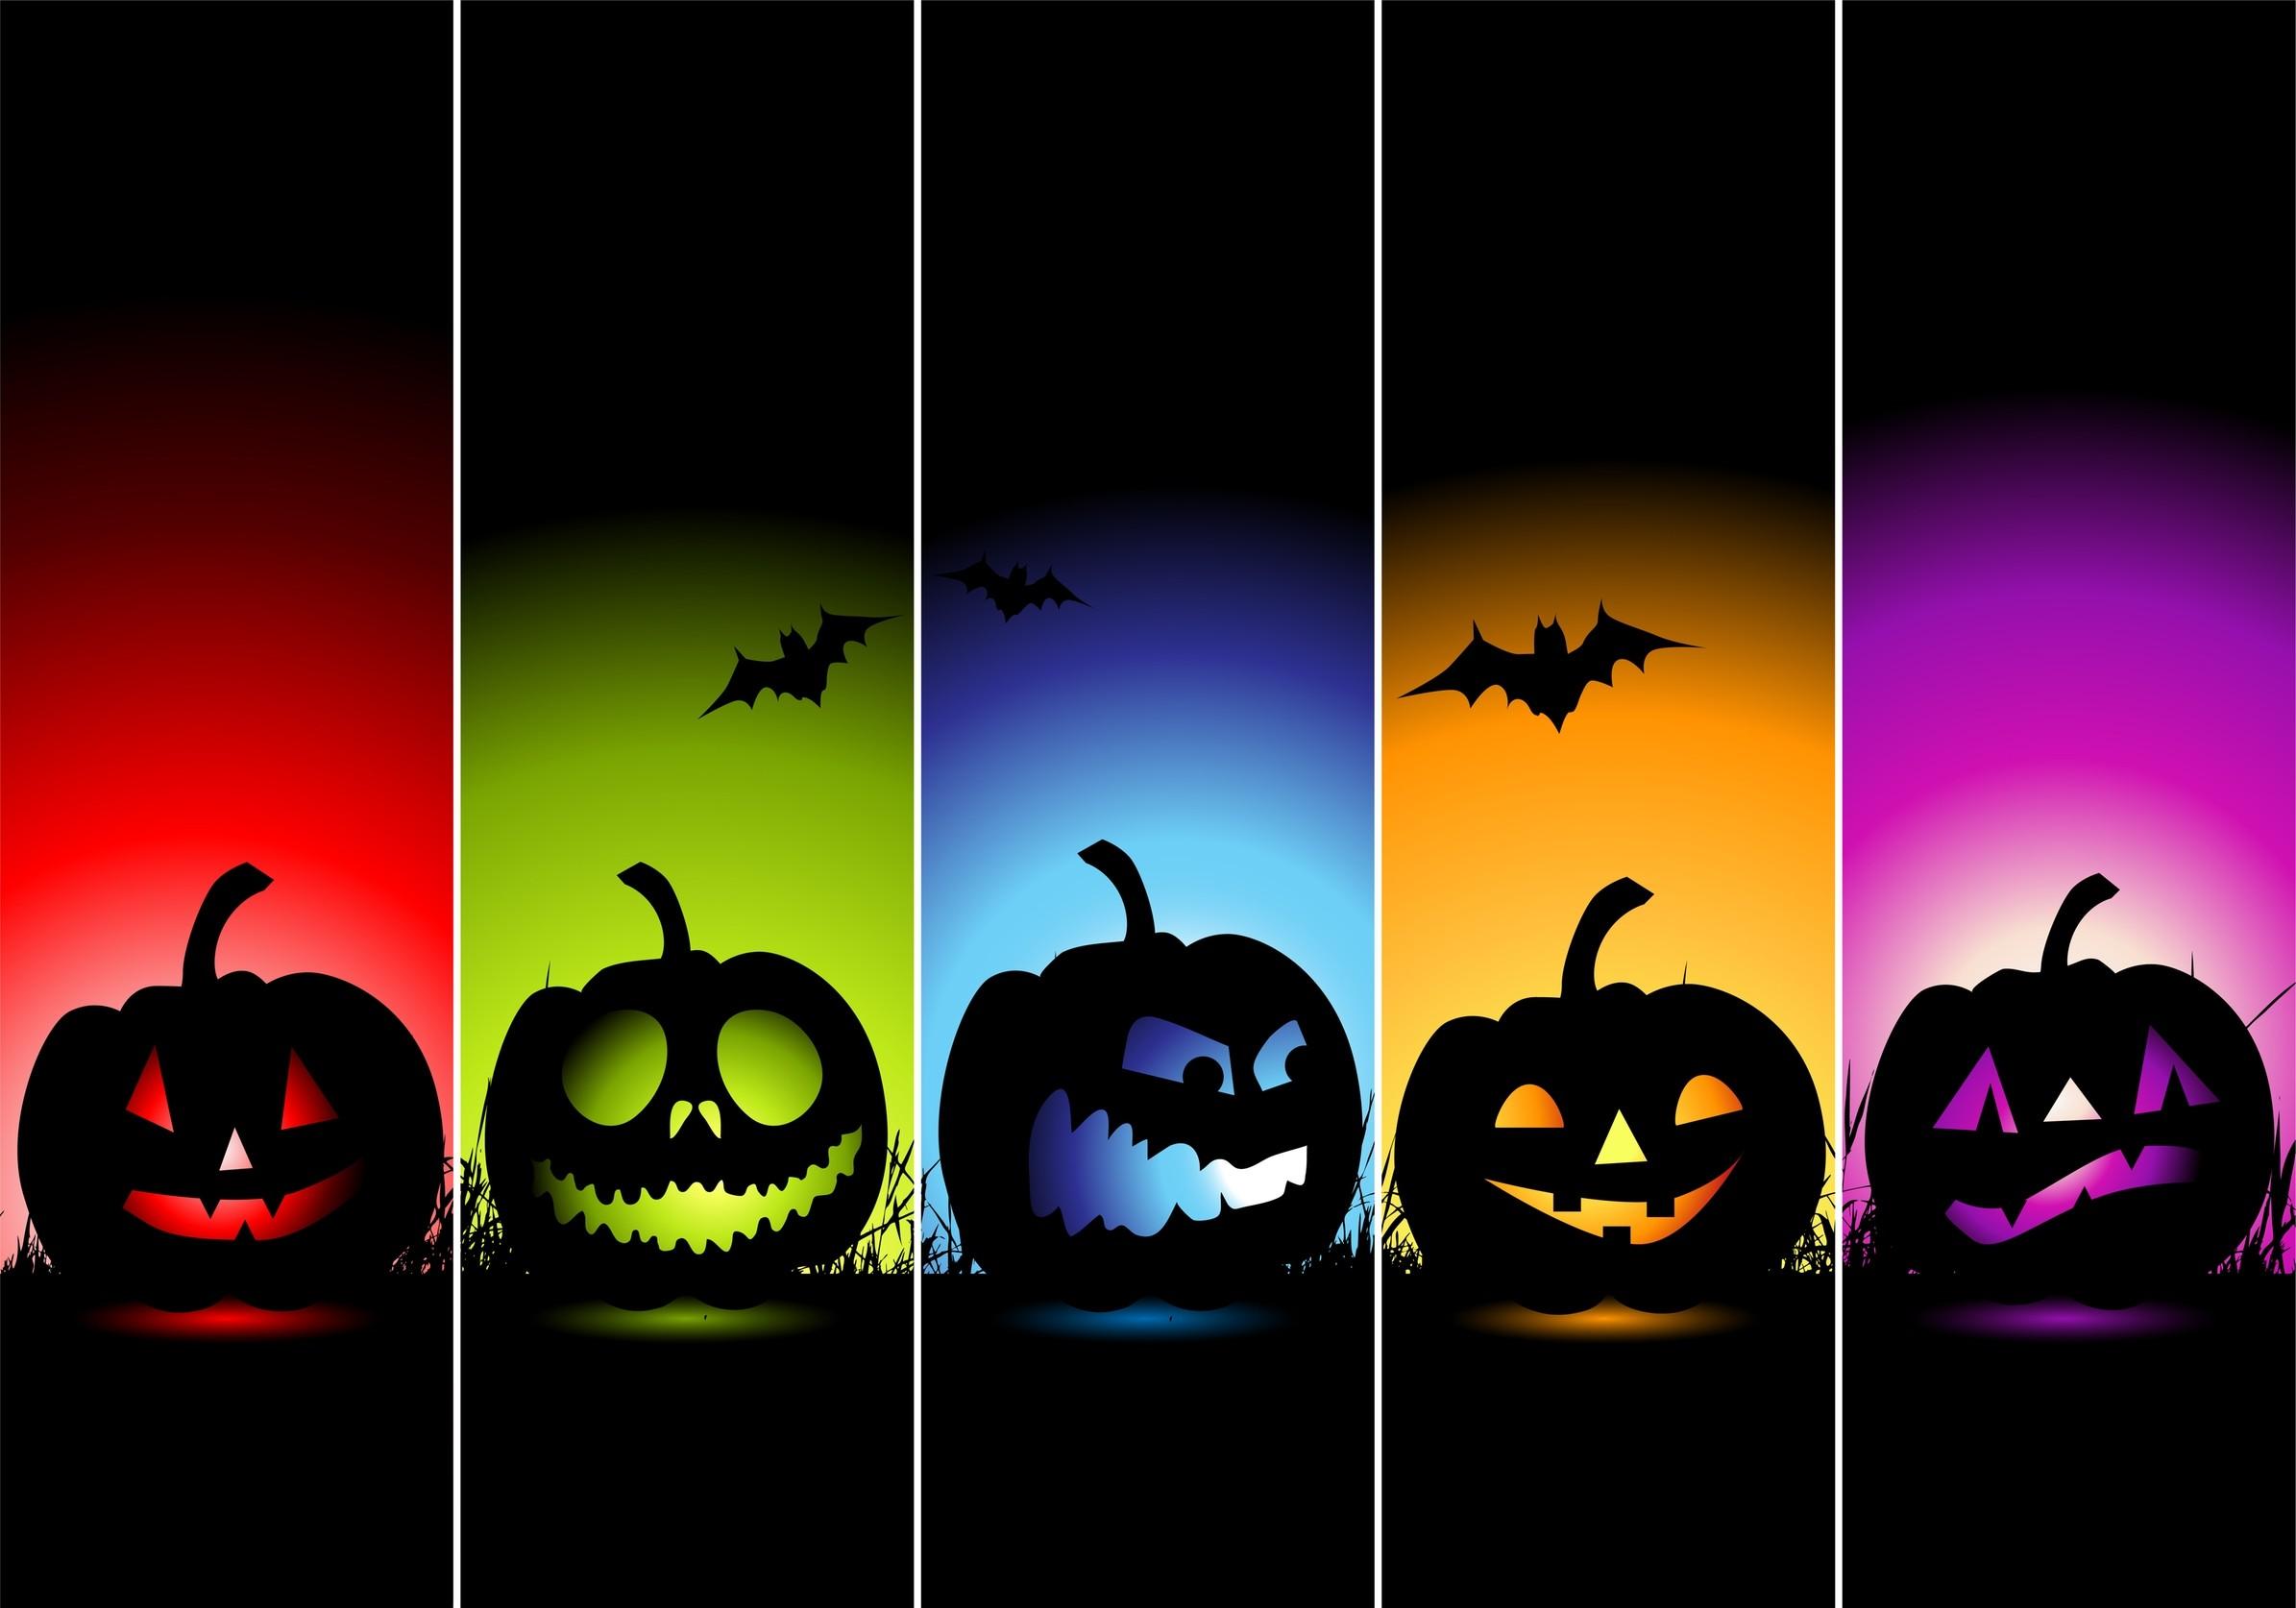 Download Wallpaper Halloween Ios - 385927-cute-halloween-backgrounds-2390x1674-for-ipad-2  Picture_661922.jpg